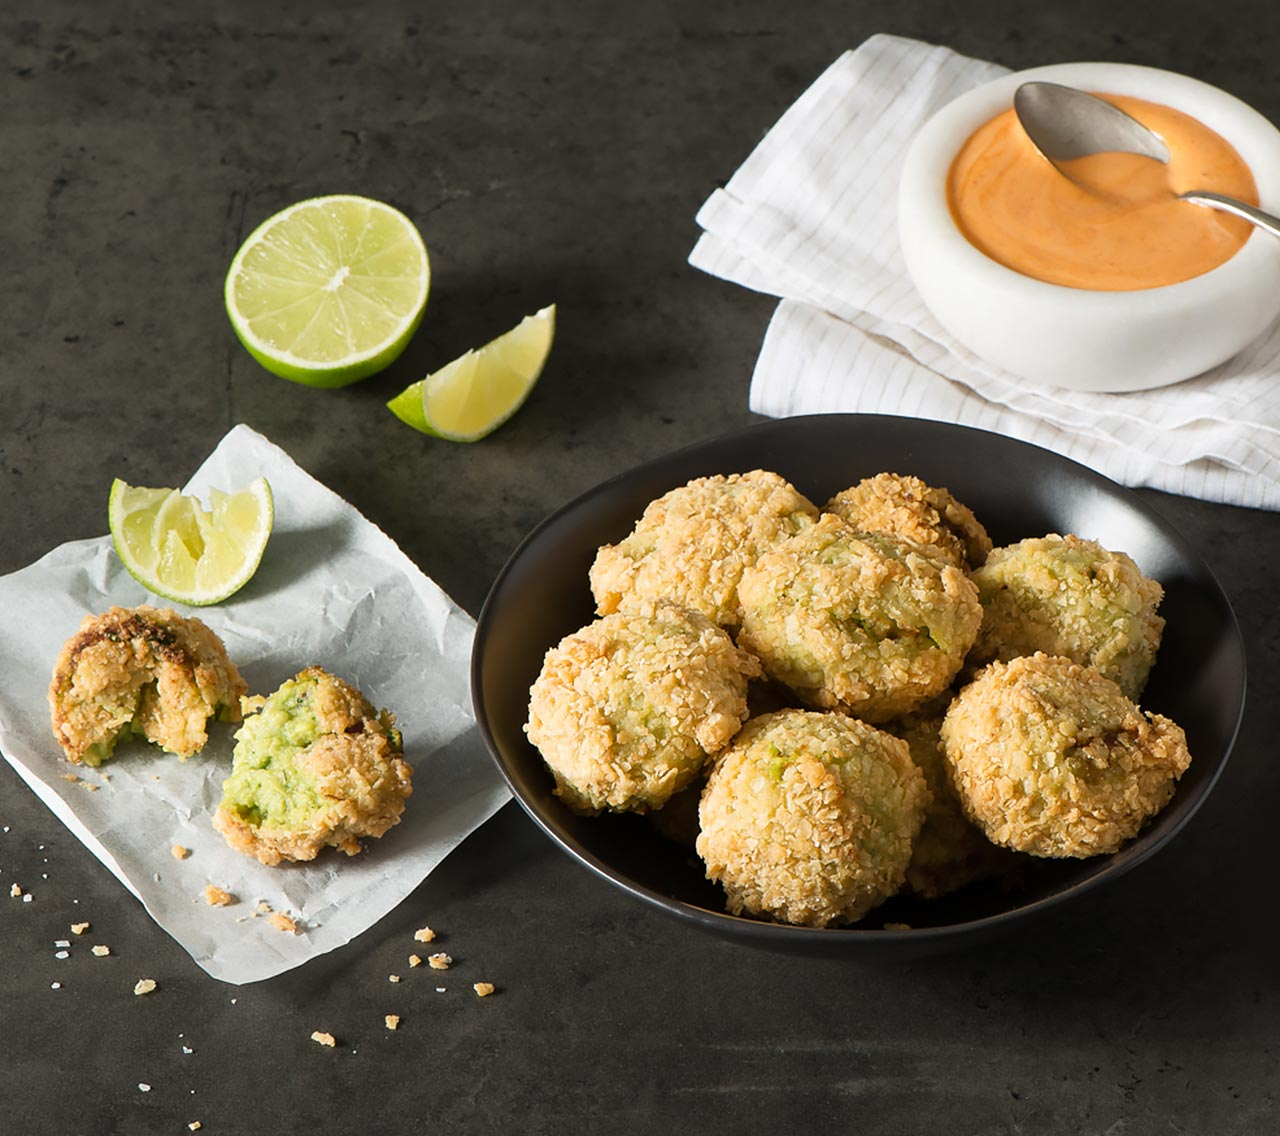 Crunchy Guacamole Bites with Salsa Rosa Dip